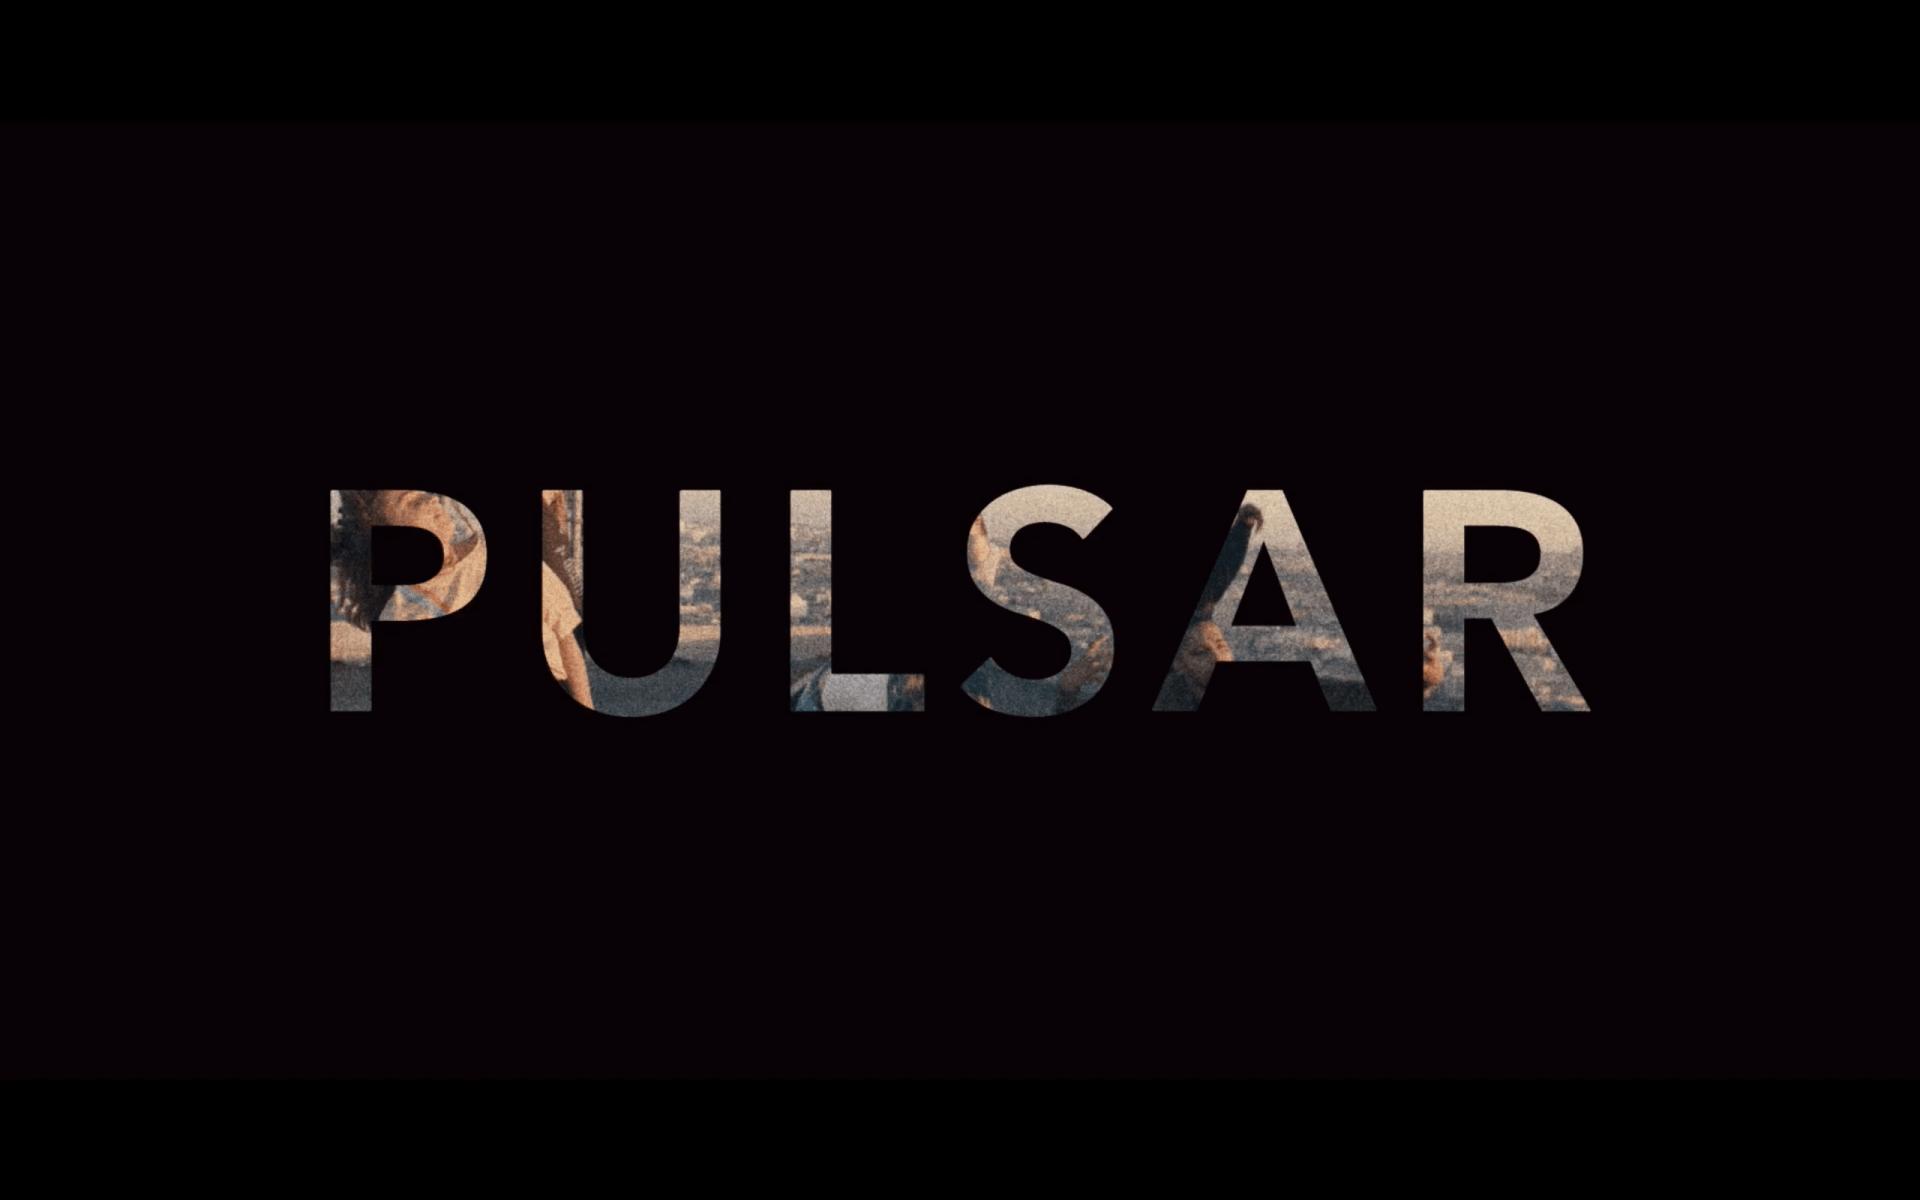 Elephant Tone Pulsar